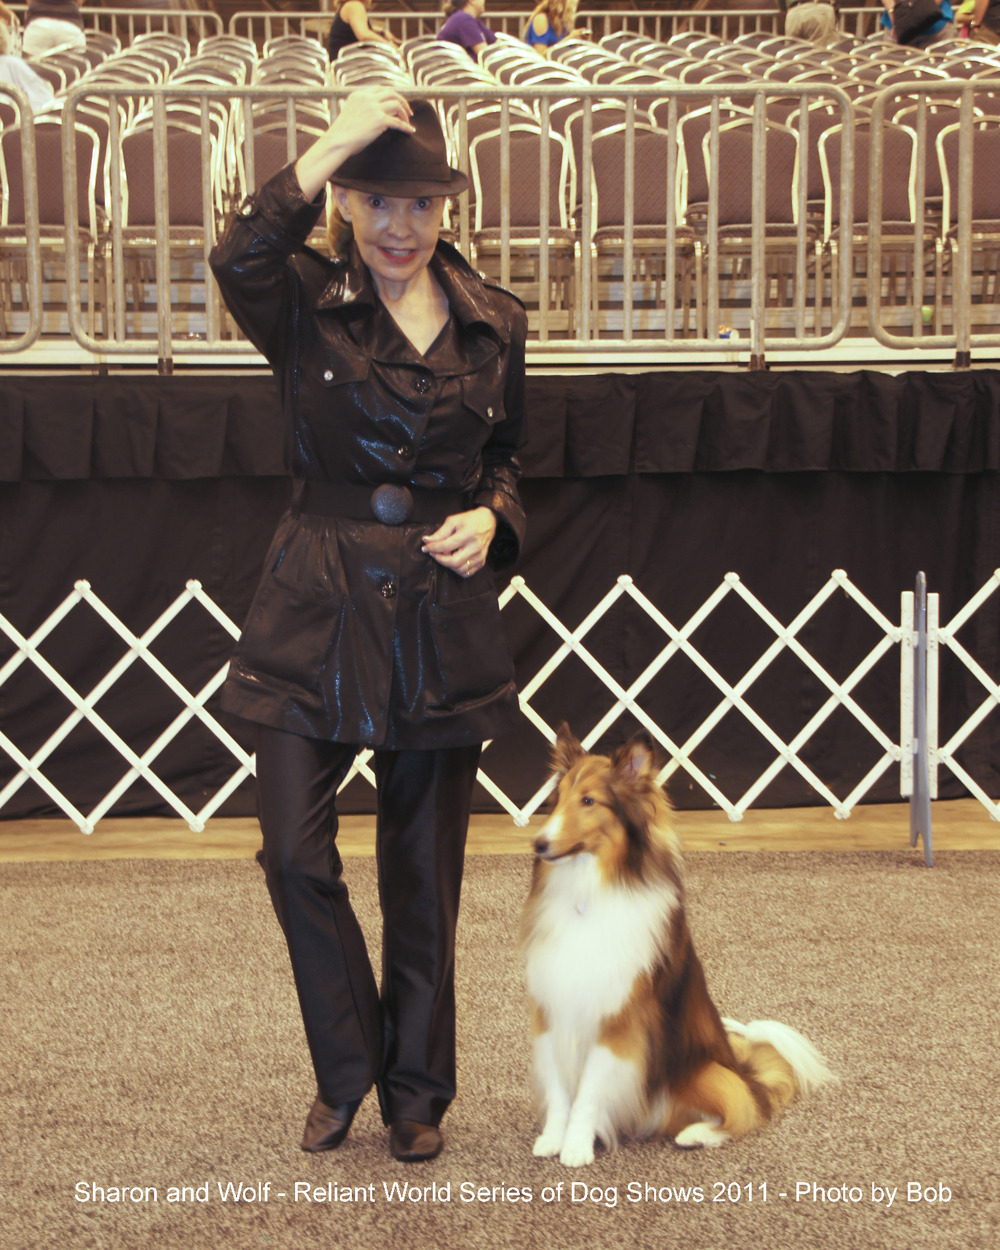 Wolf & Sharon C